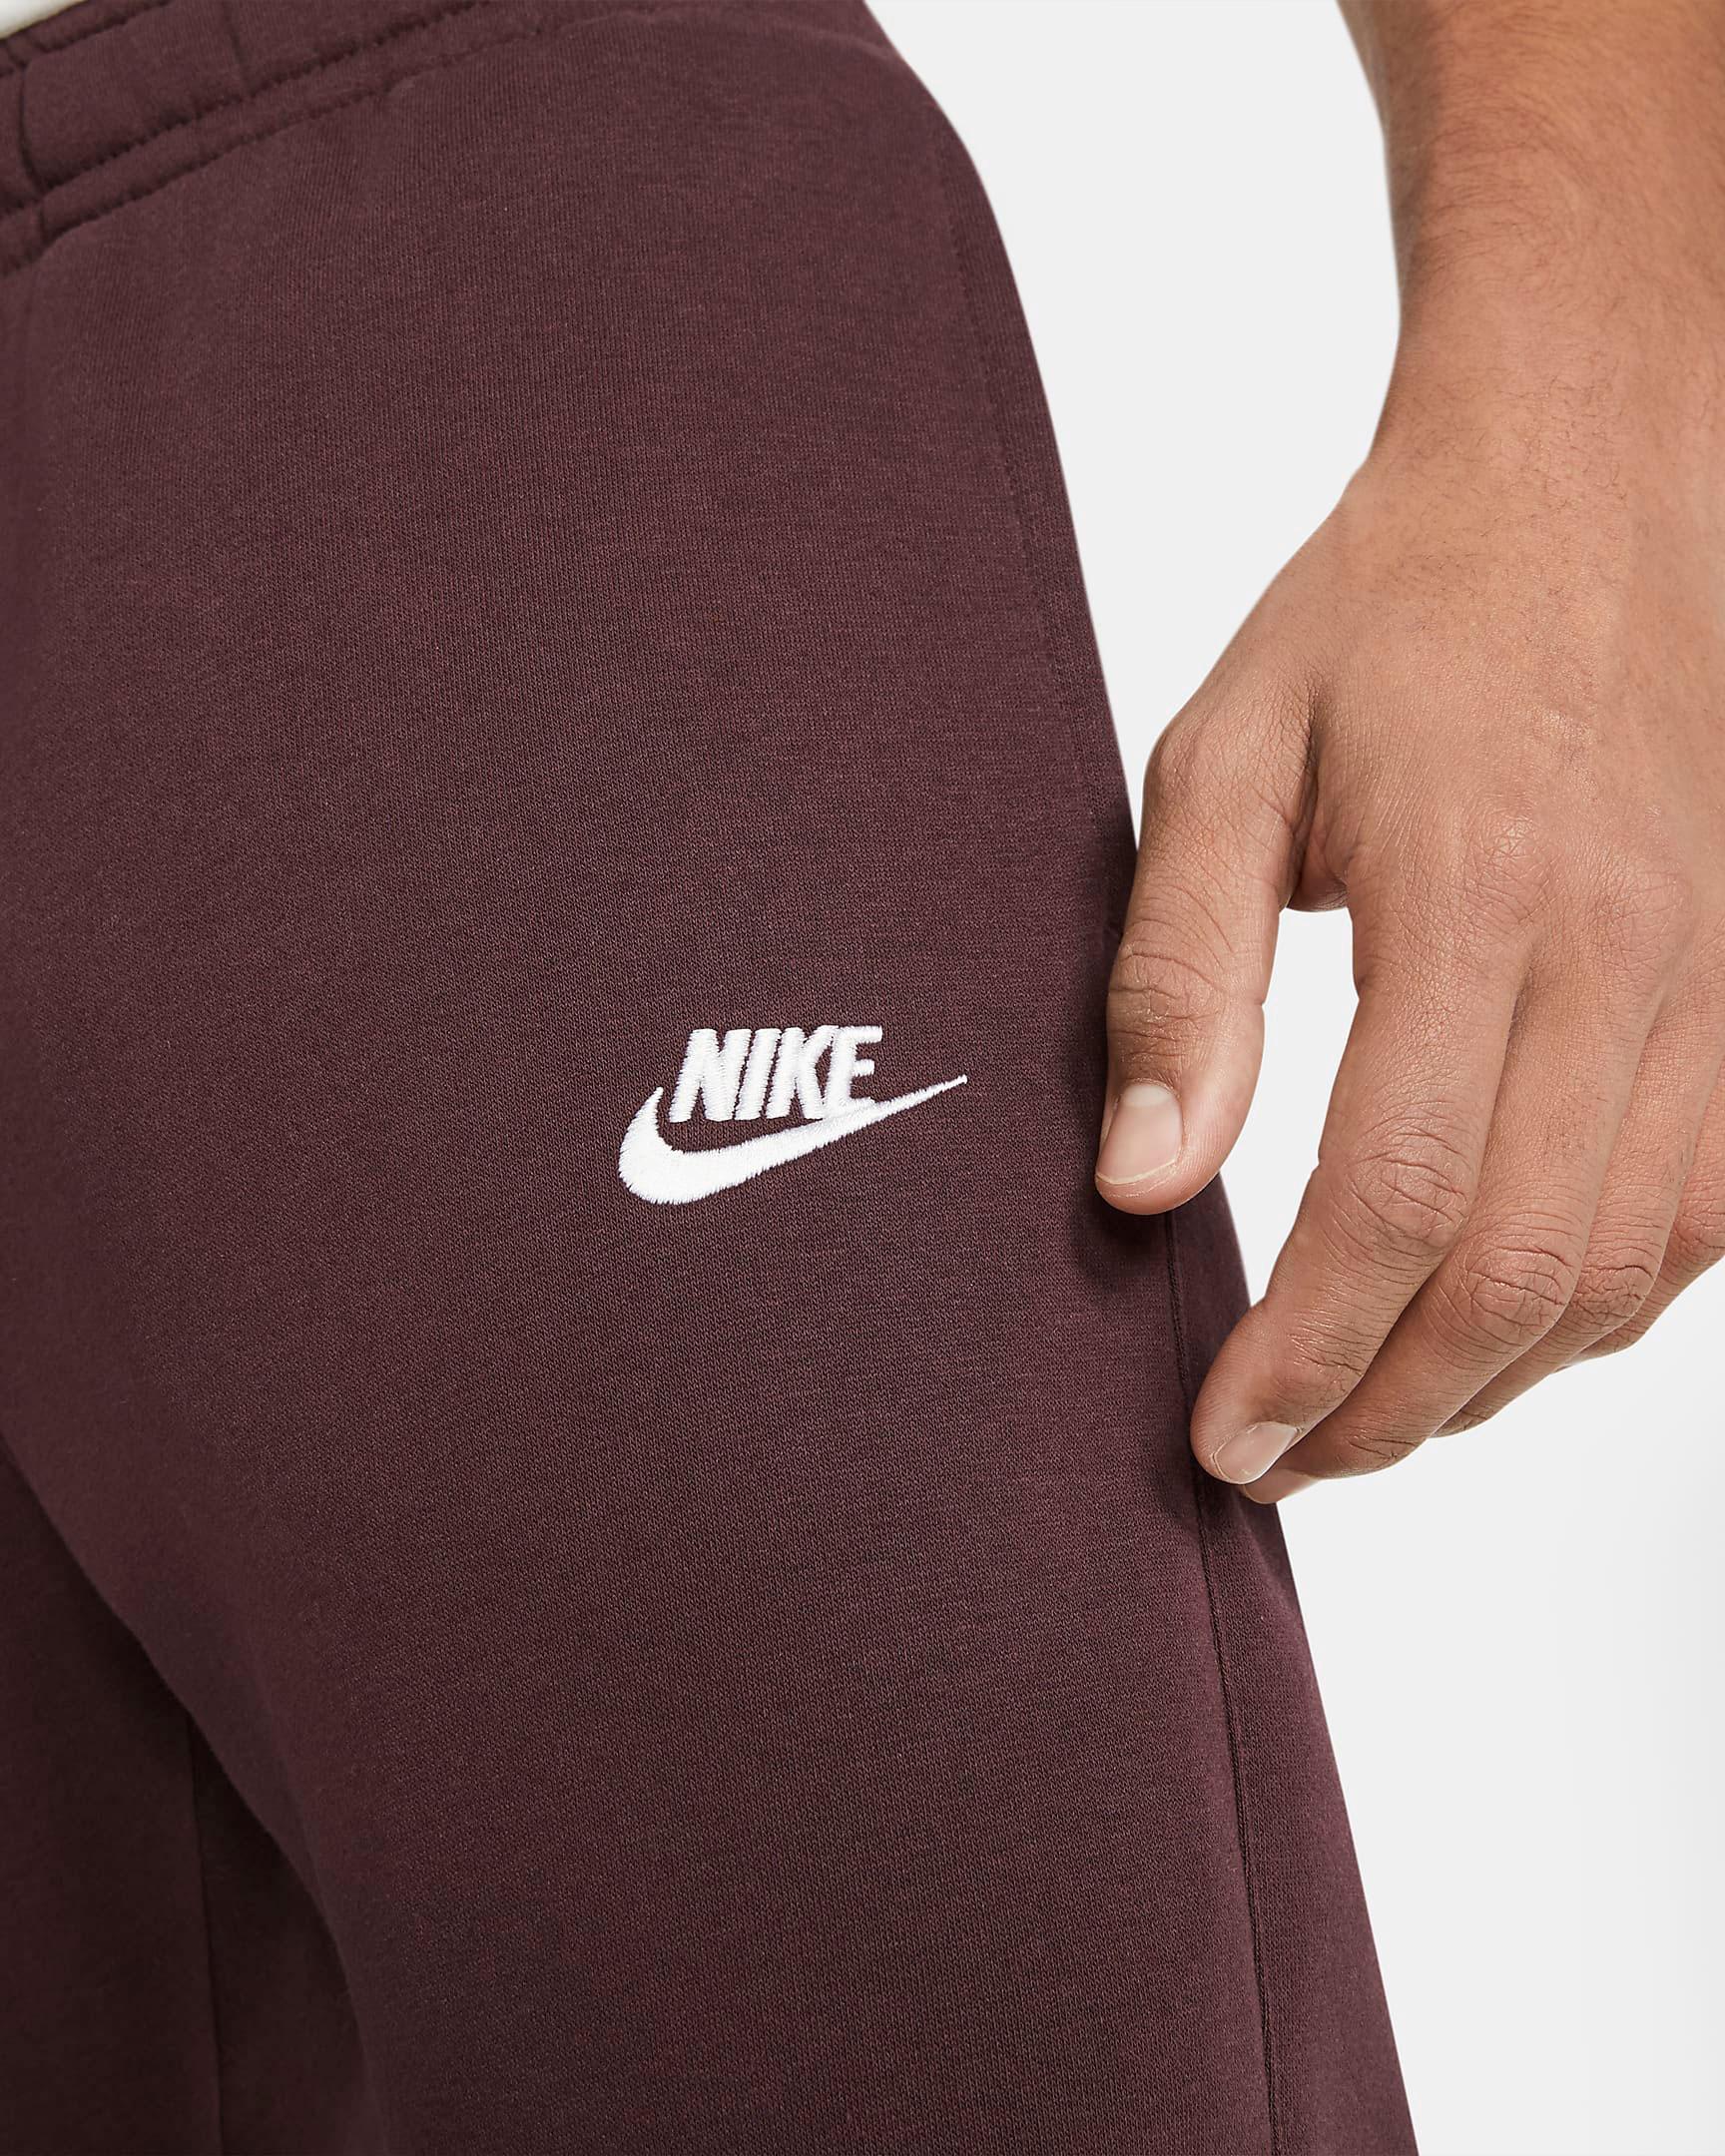 nike-club-fleece-jogger-pants-mahogany-brown-1